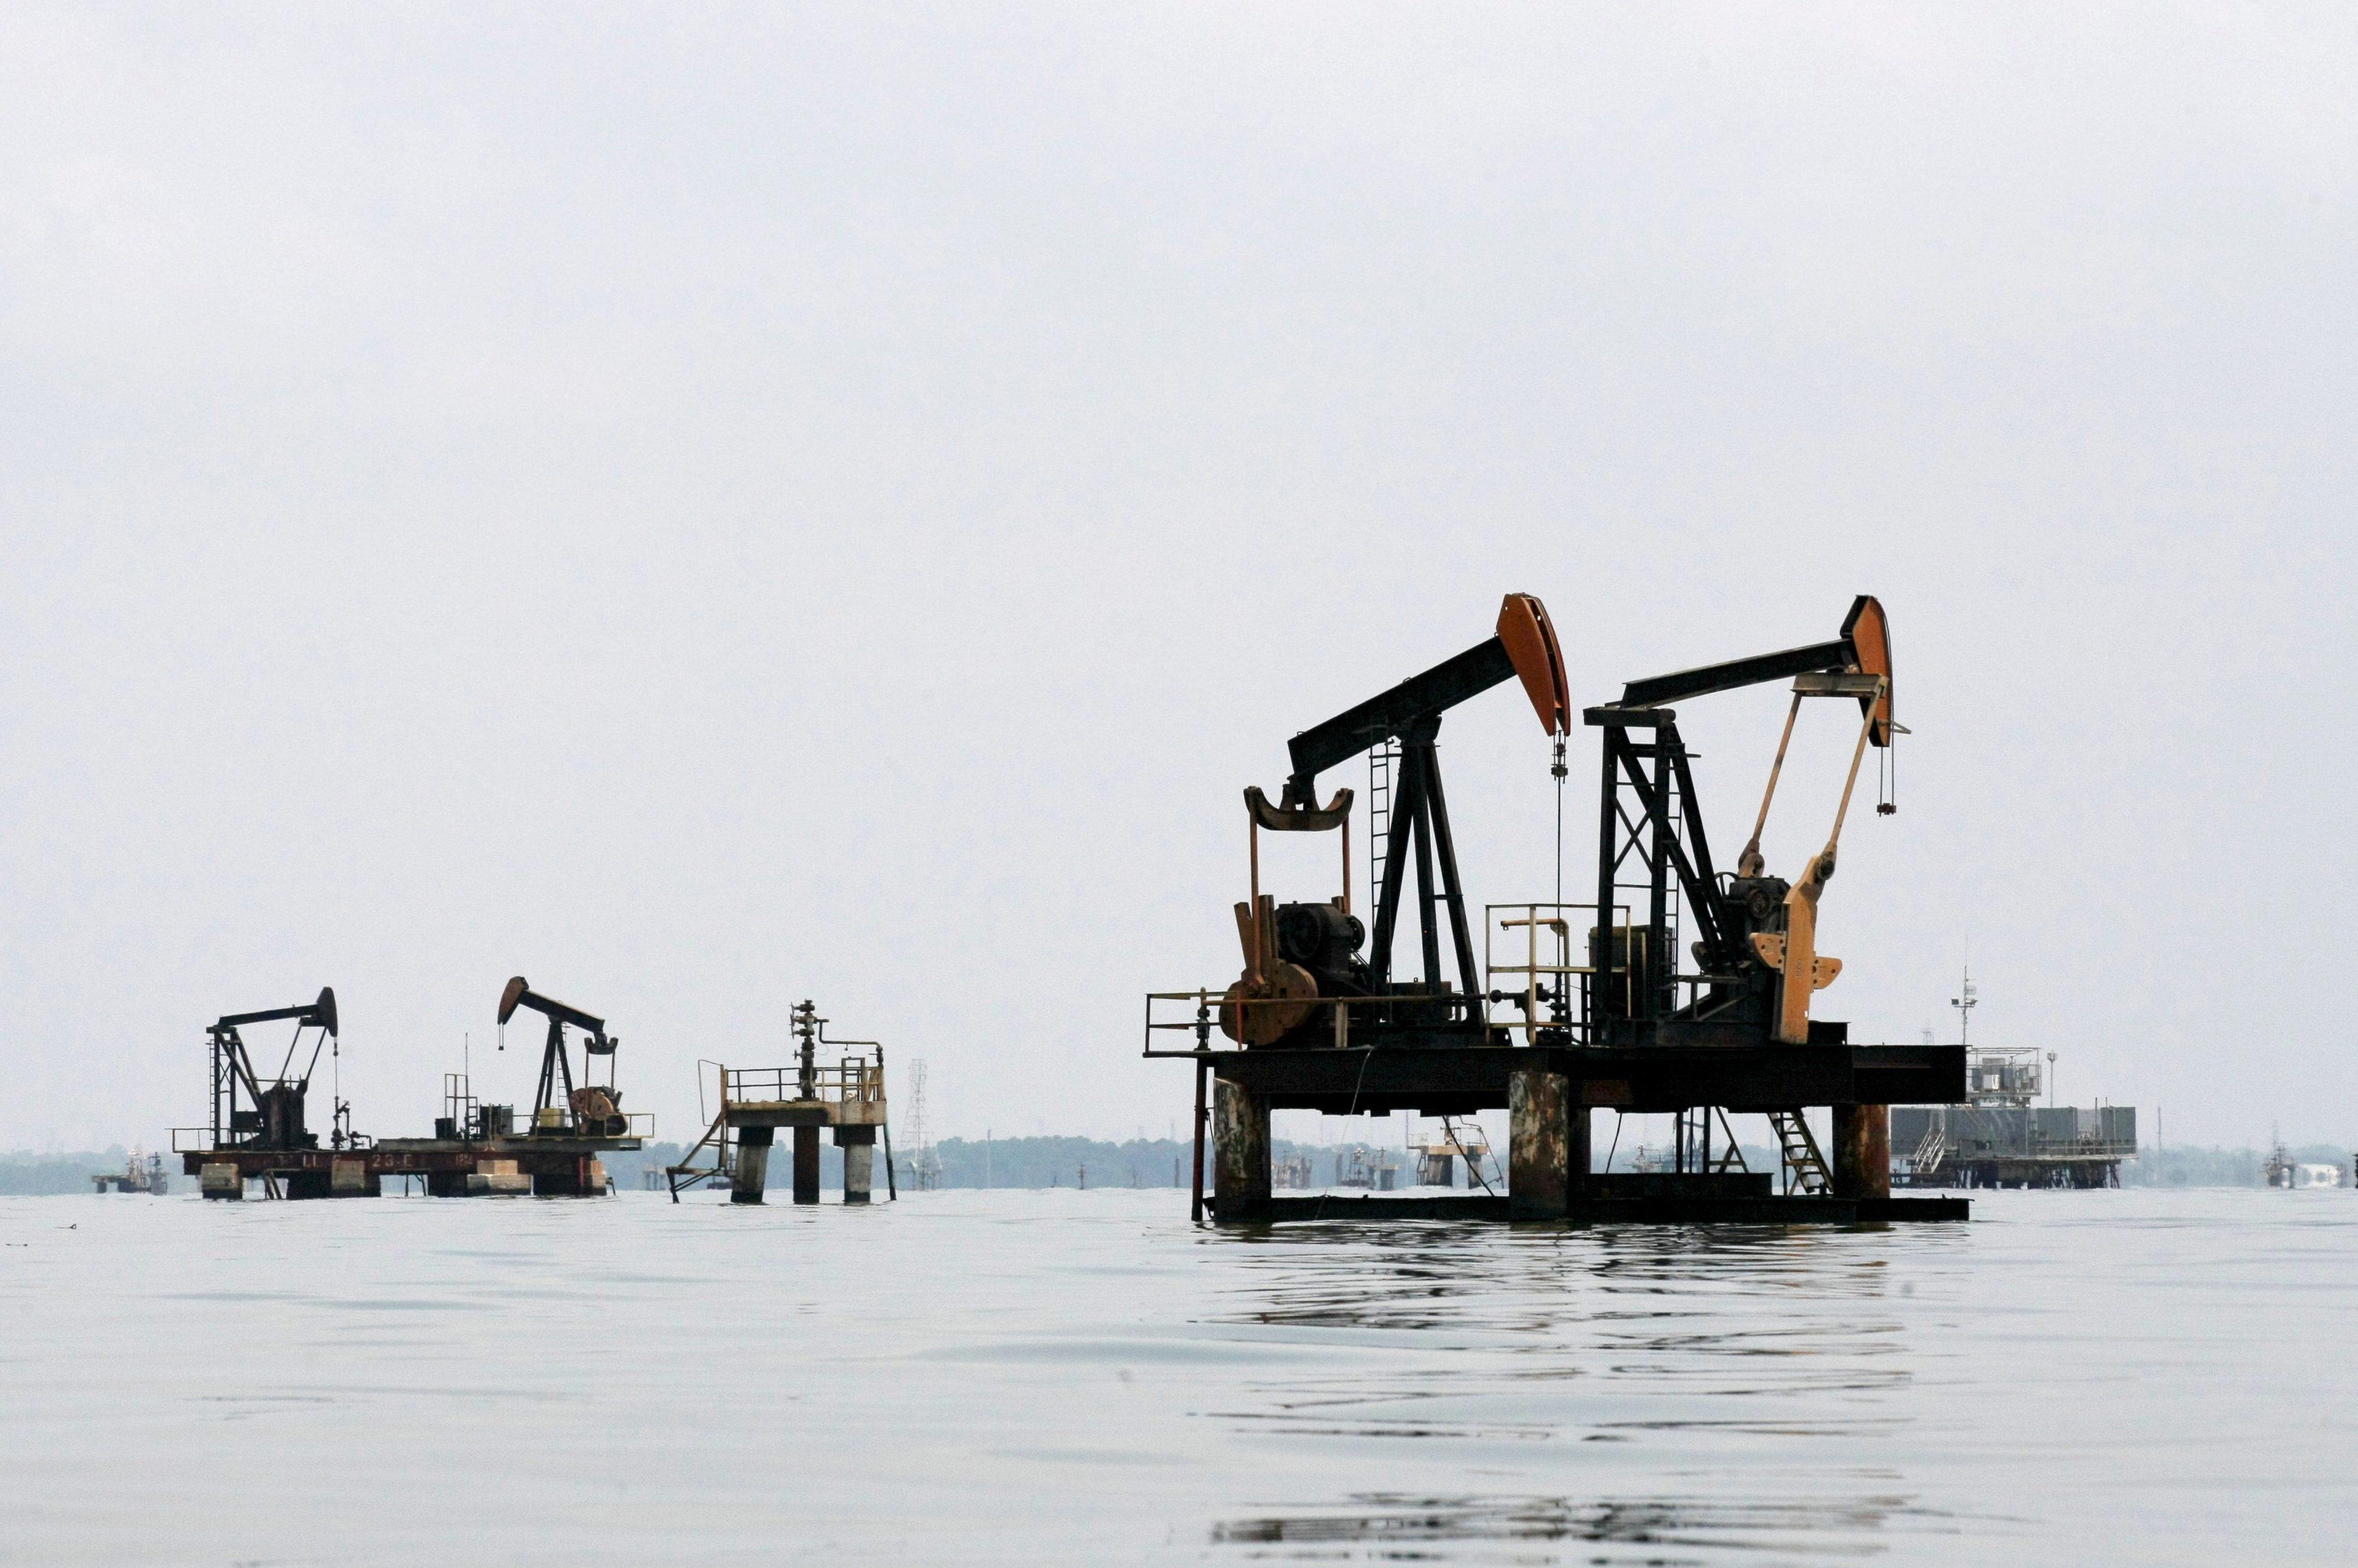 Oil pumps are seen in Lake Maracaibo, in Lagunillas, Ciudad Ojeda, in the state of Zulia, Venezuela, March 20, 2015.